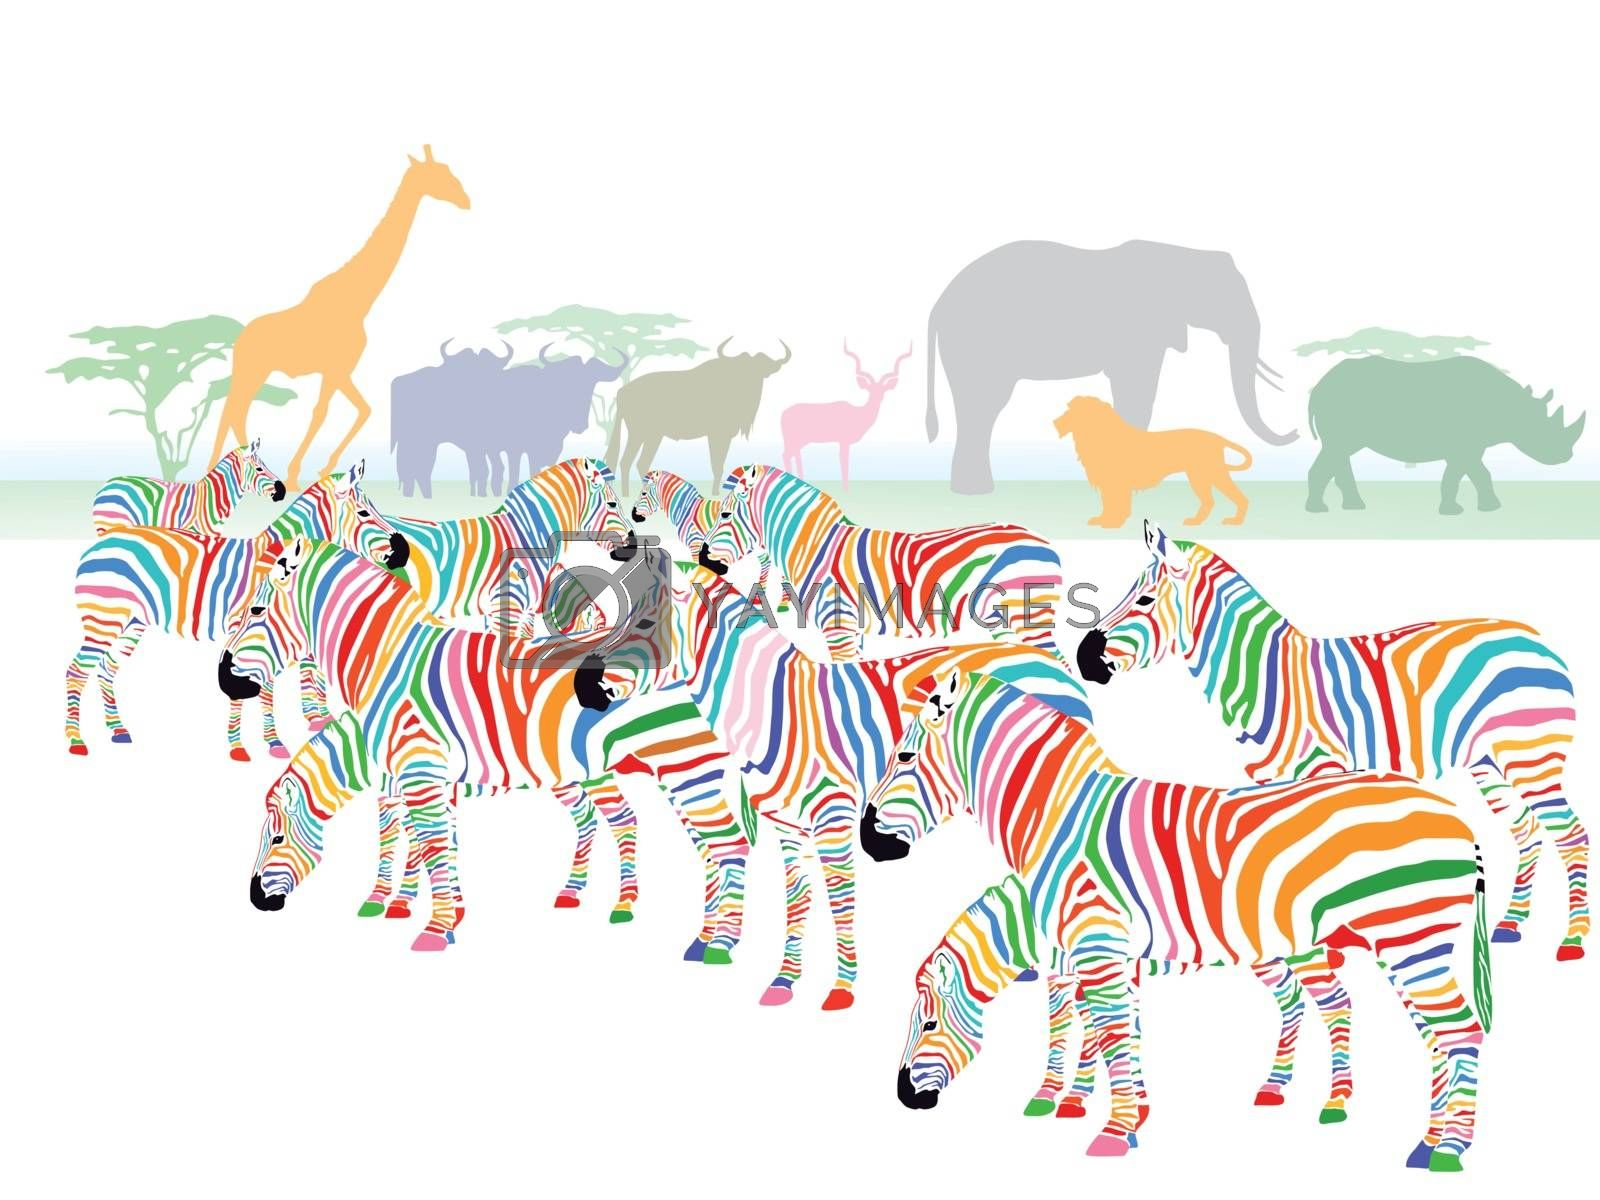 Colorful zebras in the savanna